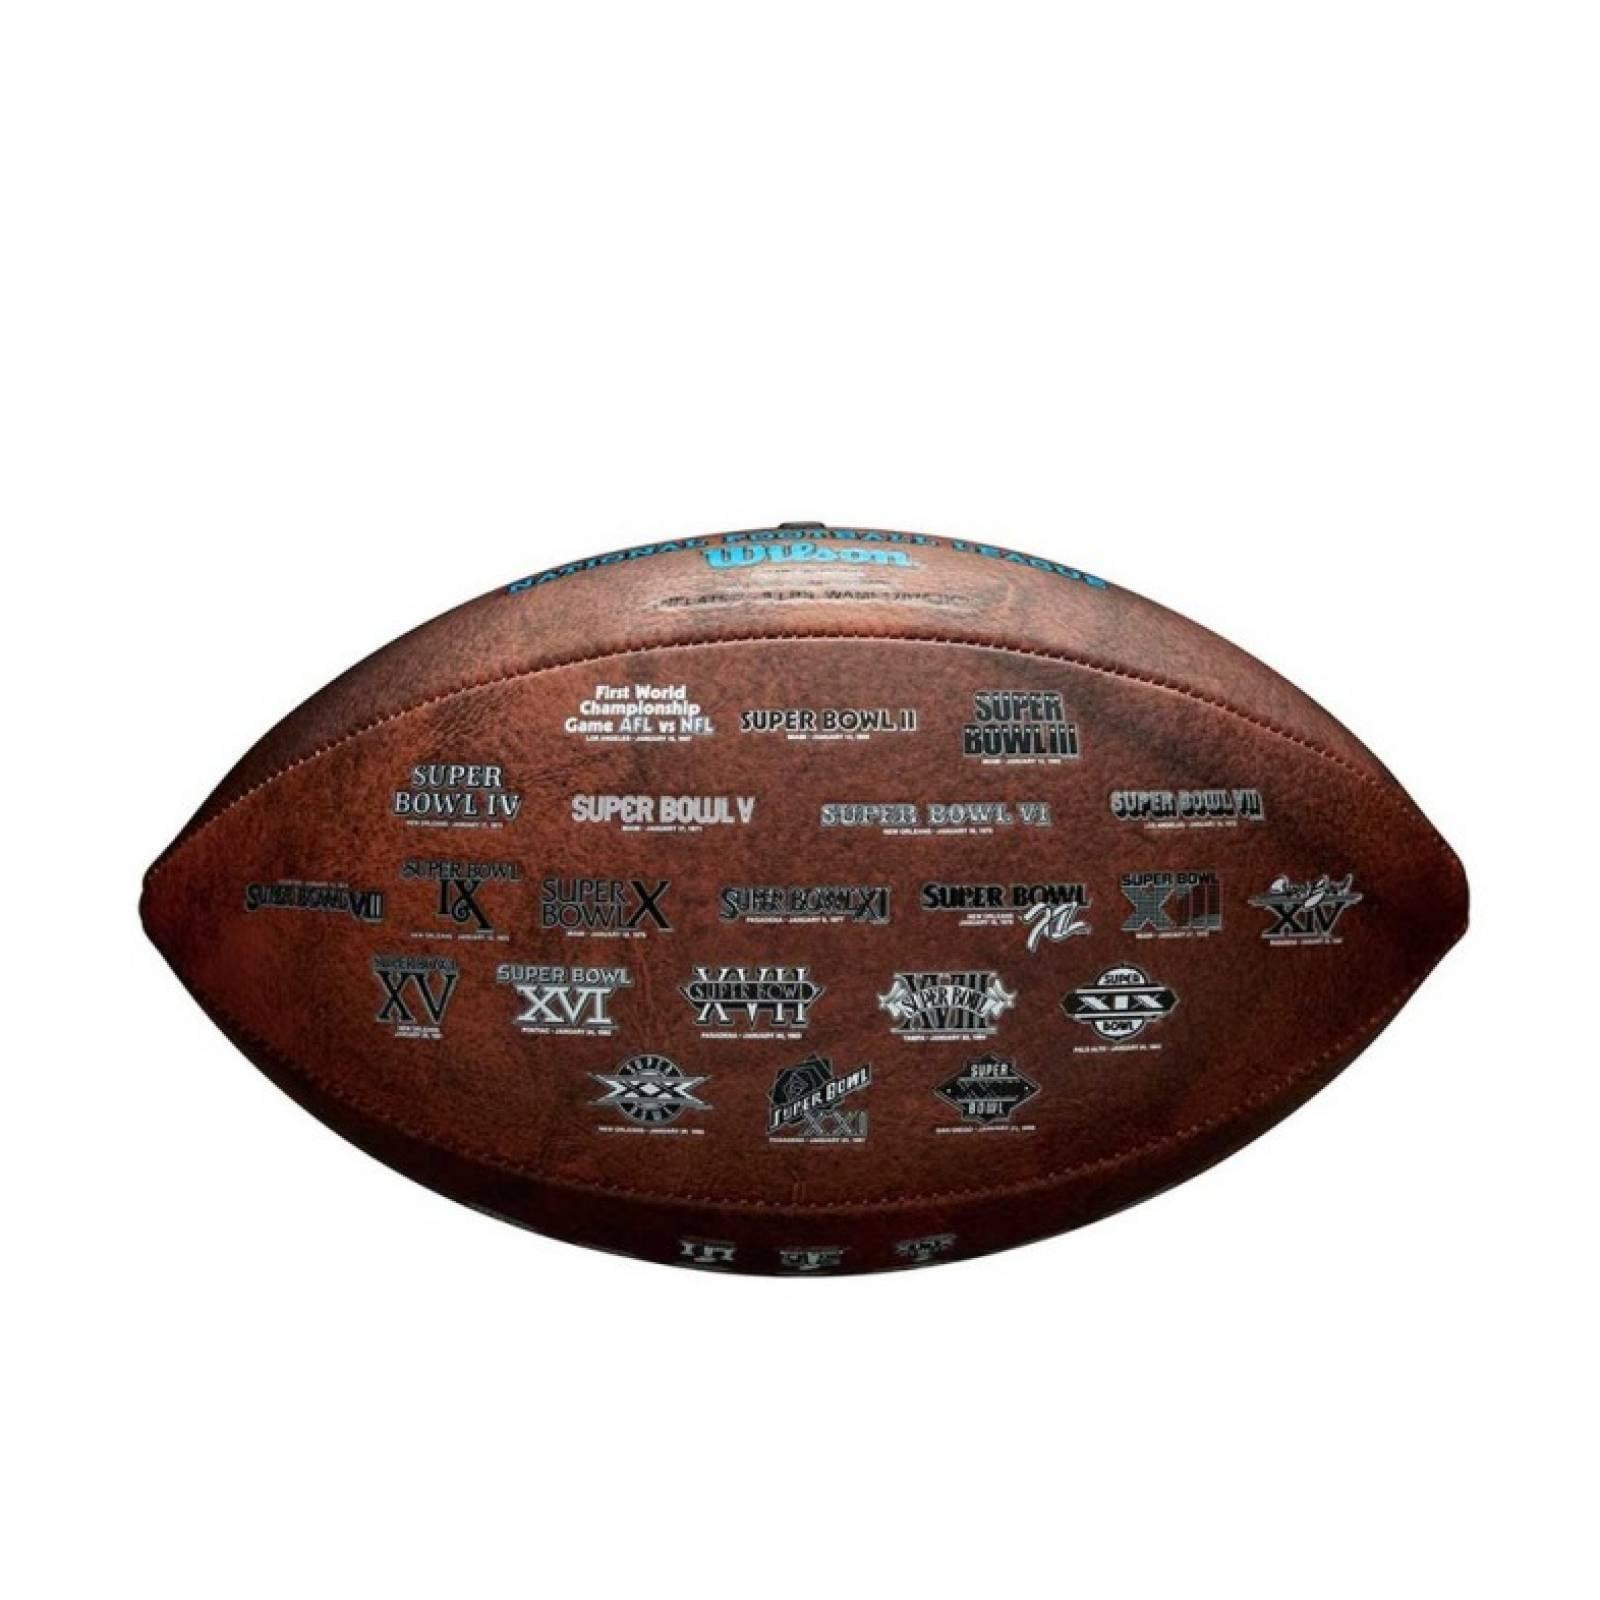 Balon Americano Conmemorativo Super Bowl 52 Piel Wilson